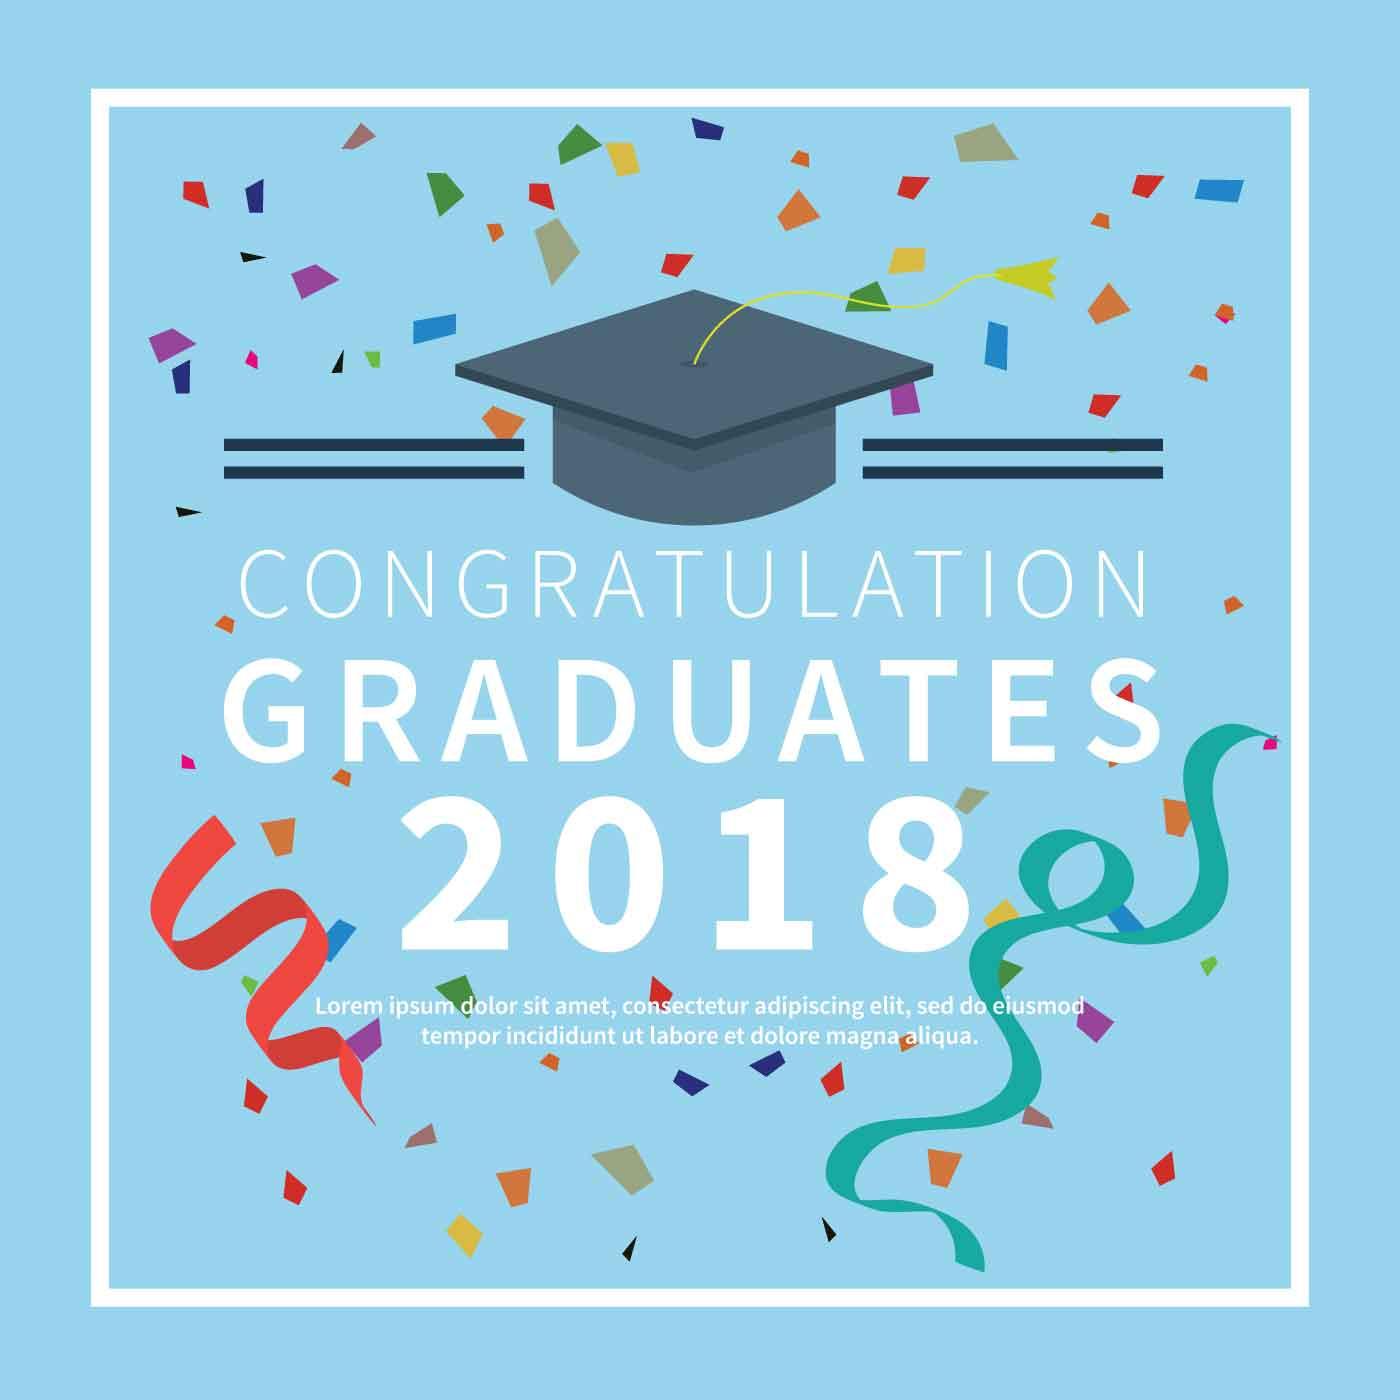 graduation card with blue background illustration